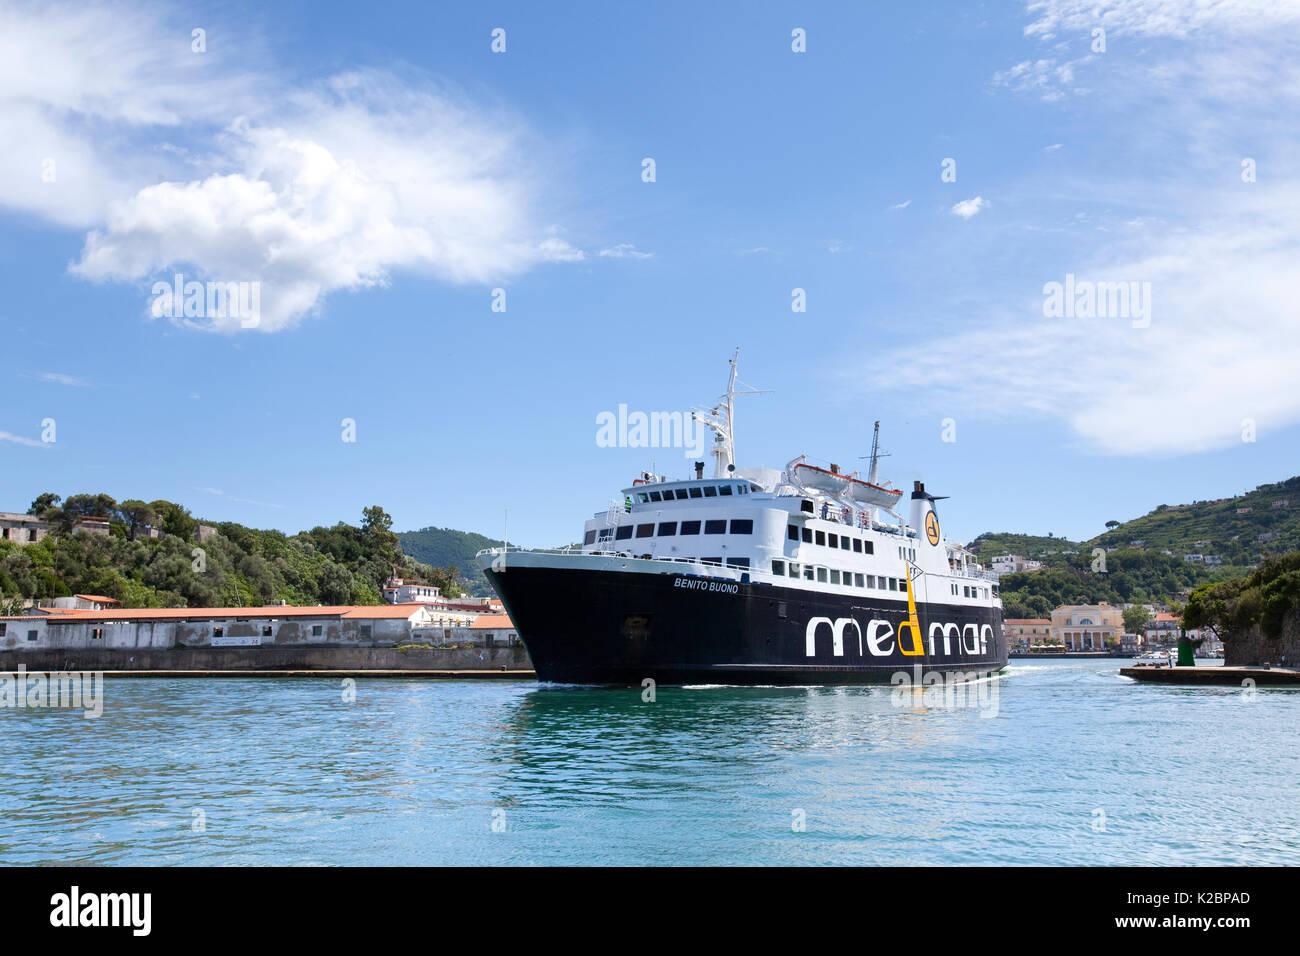 Ferry boat departs Ischia port, Ischia Island, Italy, Tyrrhenian Sea, Mediterranean. June 2009. - Stock Image